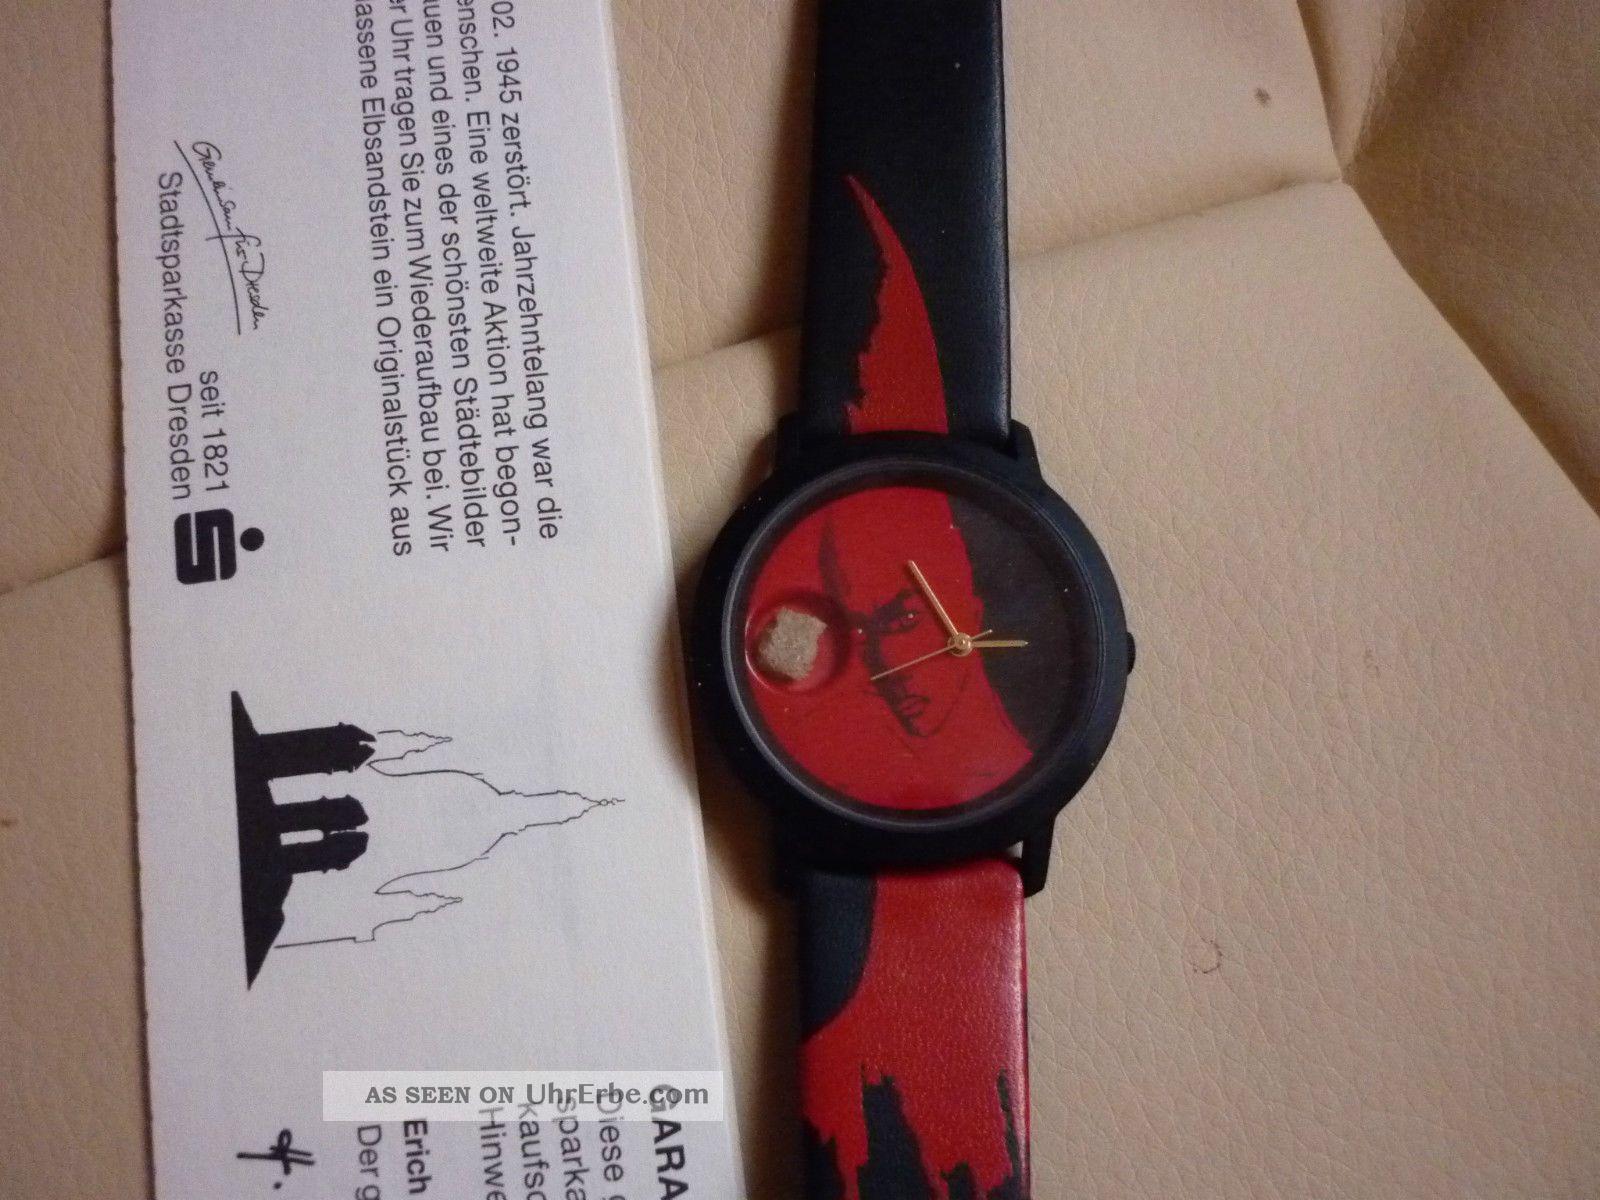 1 Dresdner Frauenkirche Uhr Sonderedition Künstleruhr Angela Hampel Armbanduhren Bild